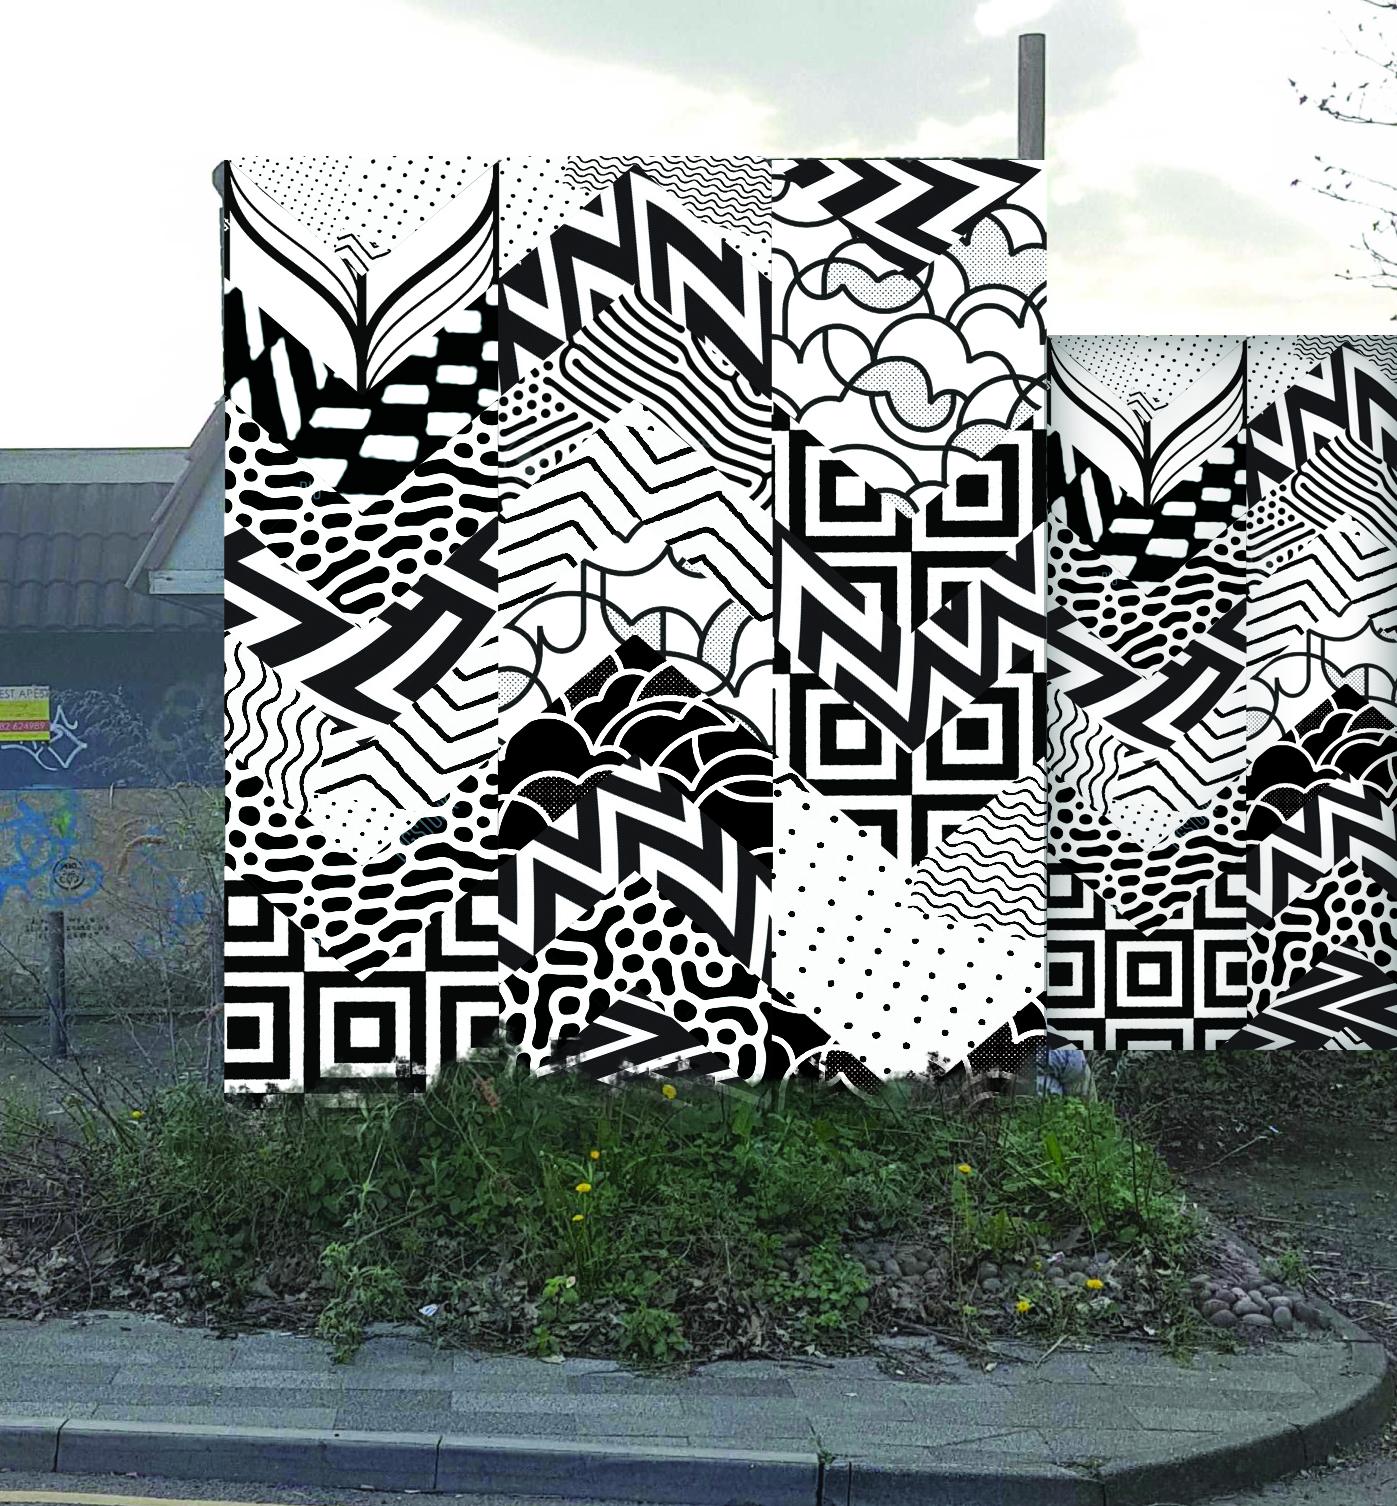 Clough_Street_Mockup_A.jpg